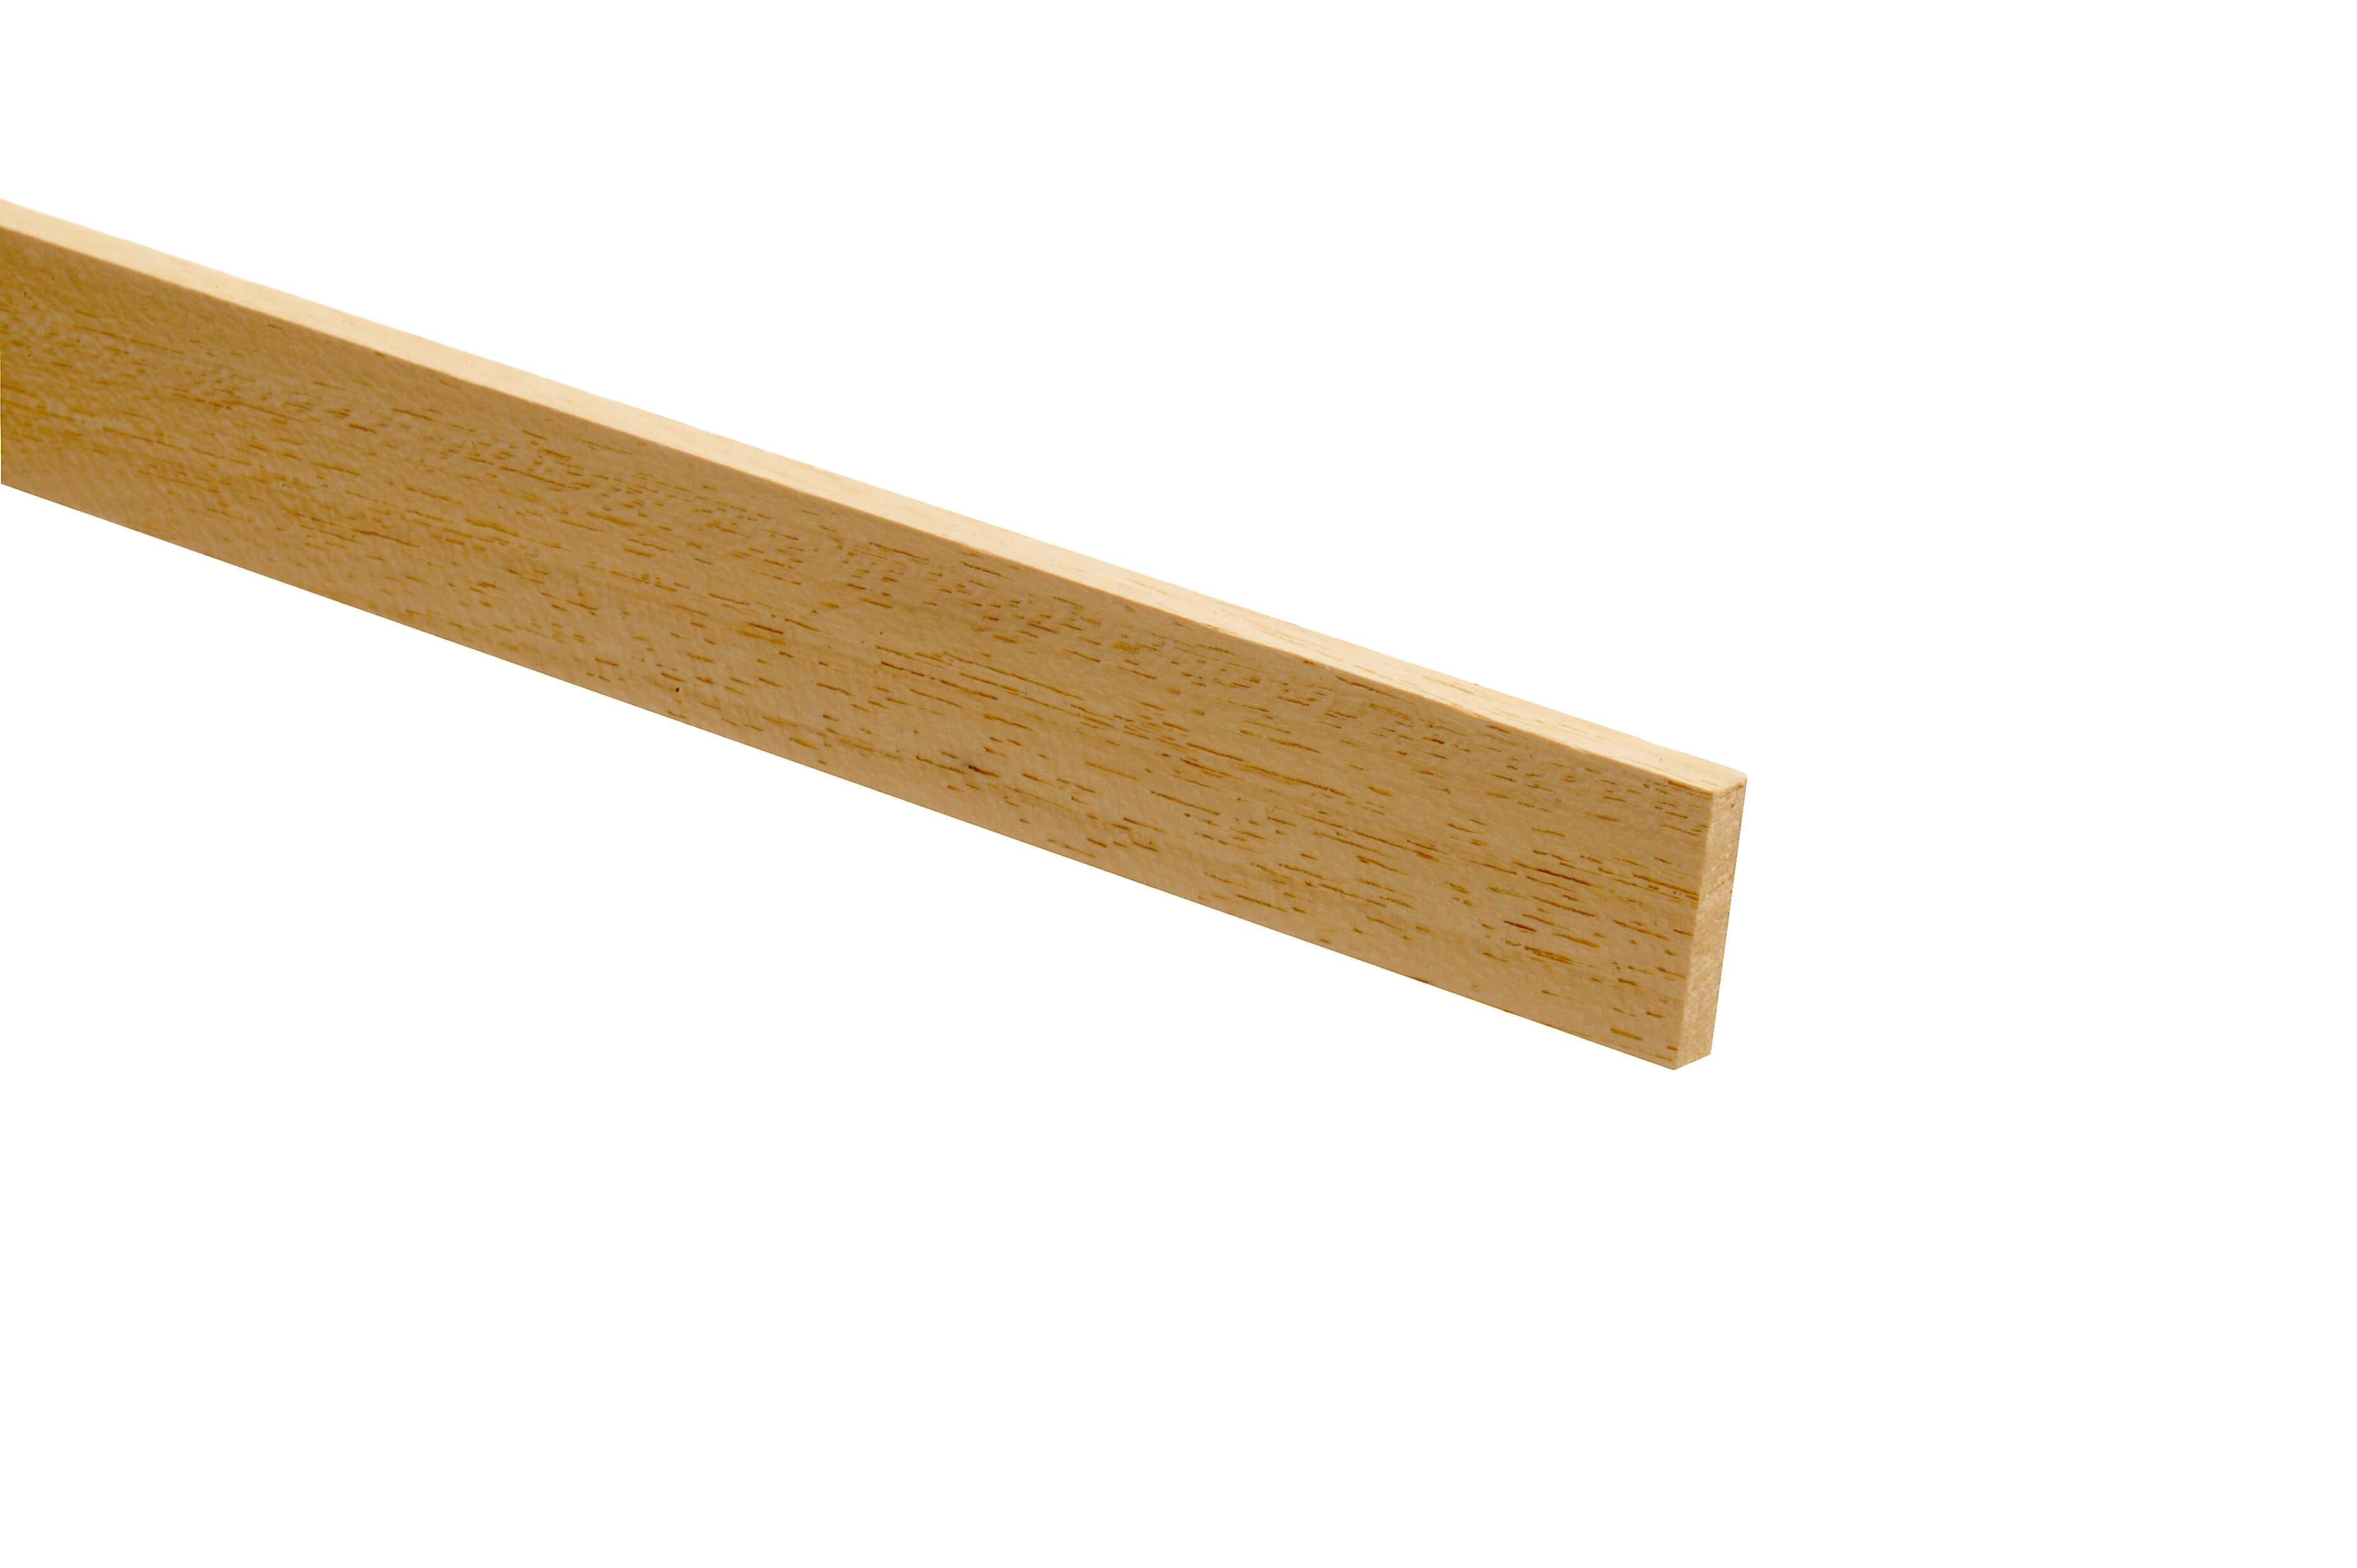 35 Light Hardwood PSE Stripwood 6 x 21 x 2400mm